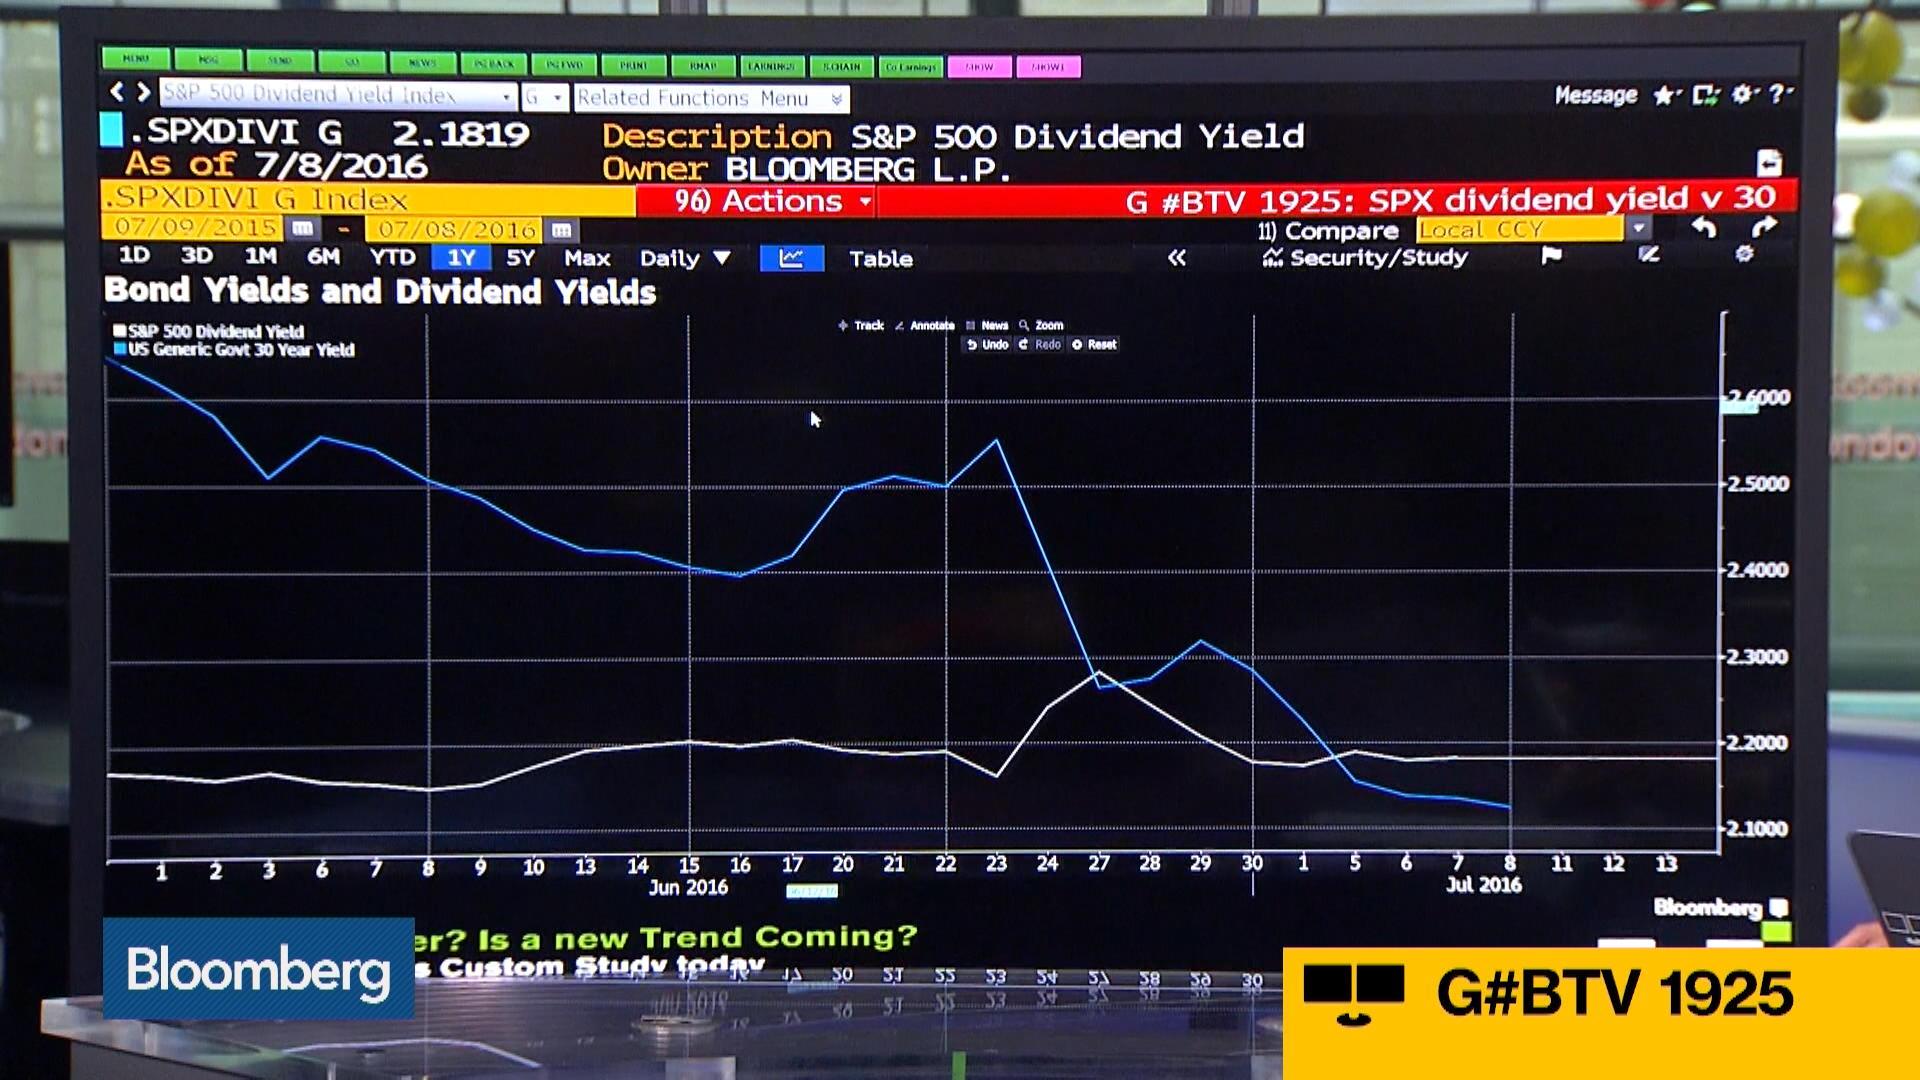 Investors Dilemma Dividend Yields Versus Bond Yields Bloomberg